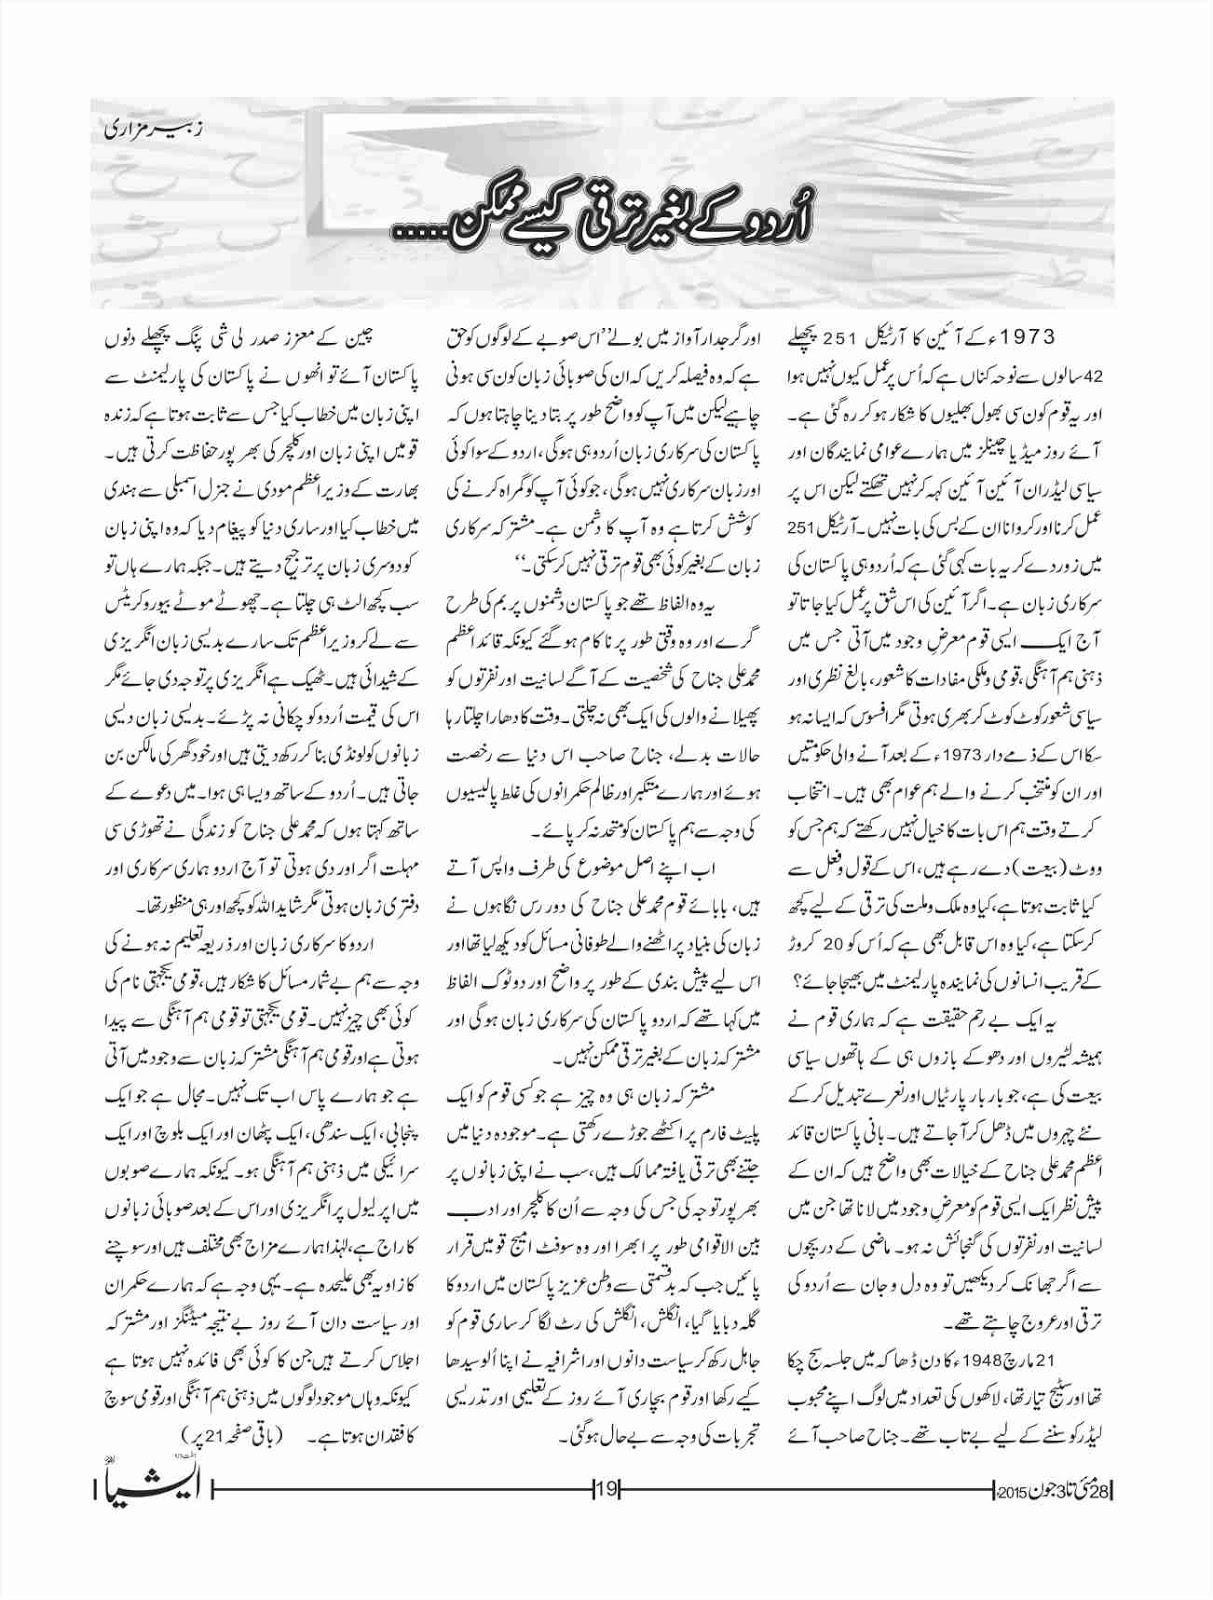 Search Results of short essay on khidmat e khalq in urdu